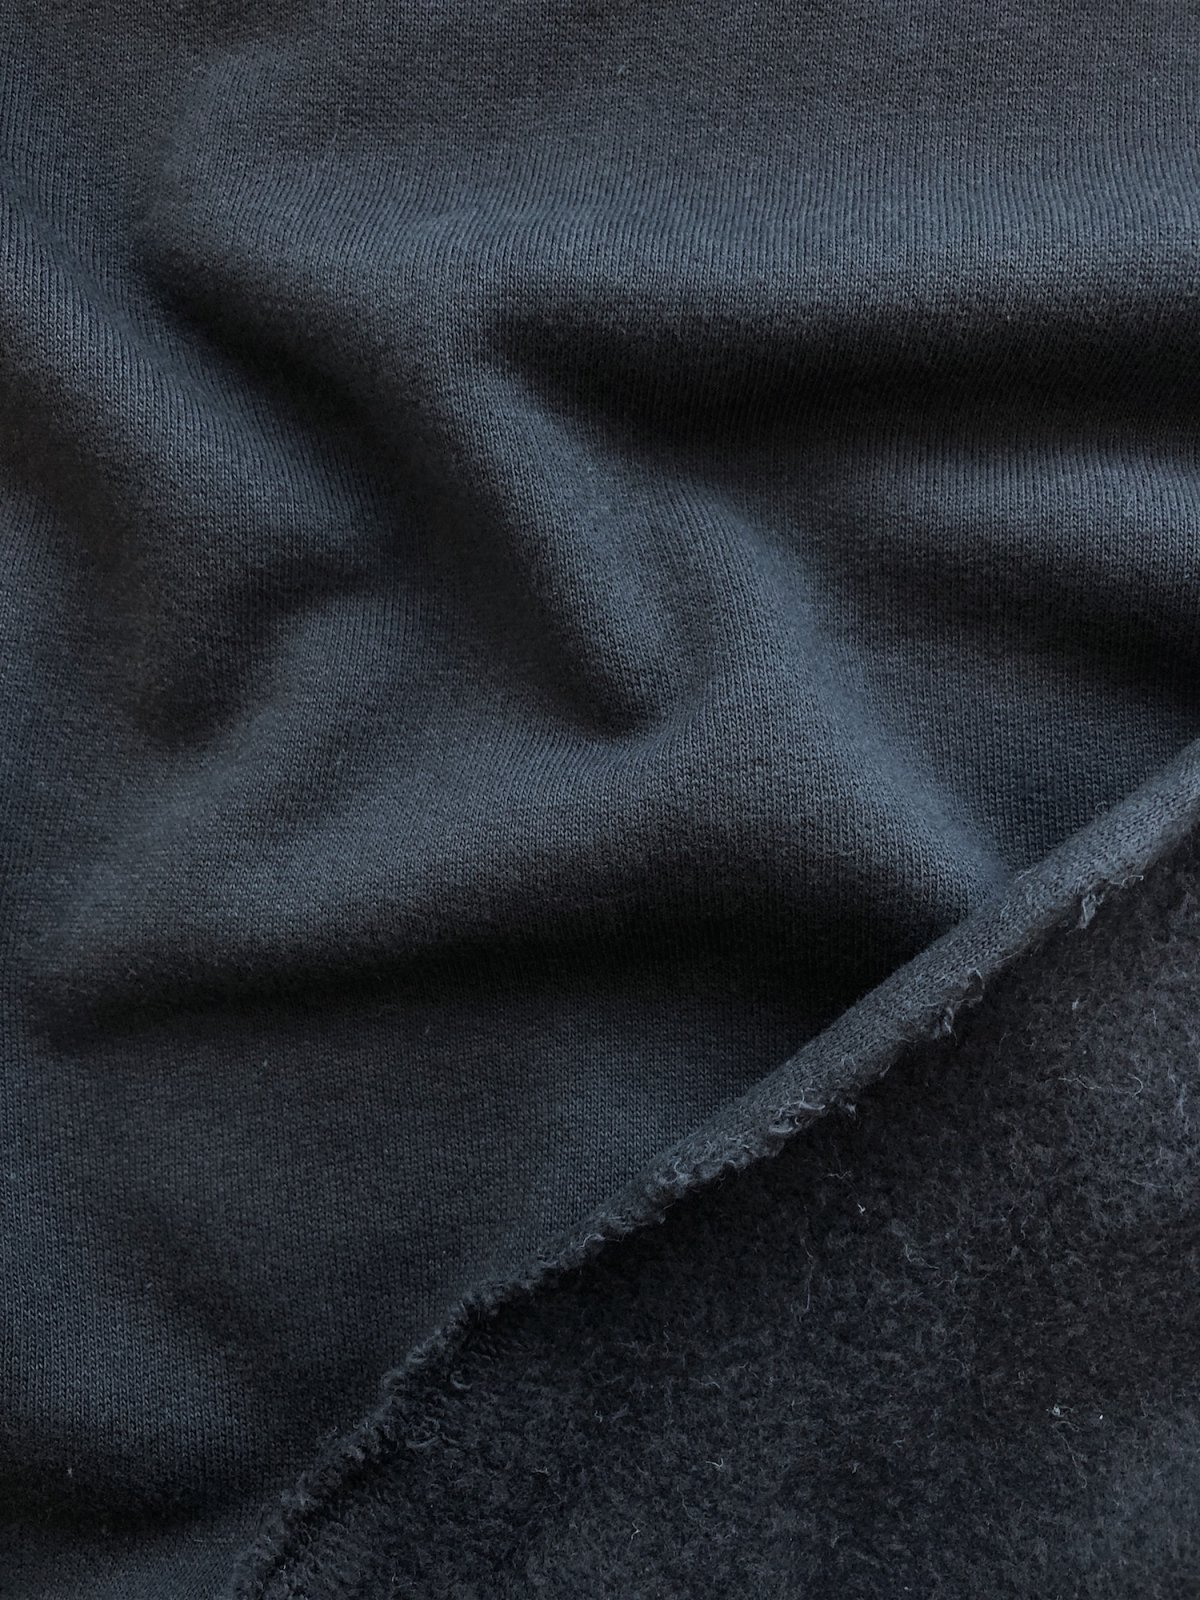 Birch Fabrics - Organic Sweatshirt Fleece - Black